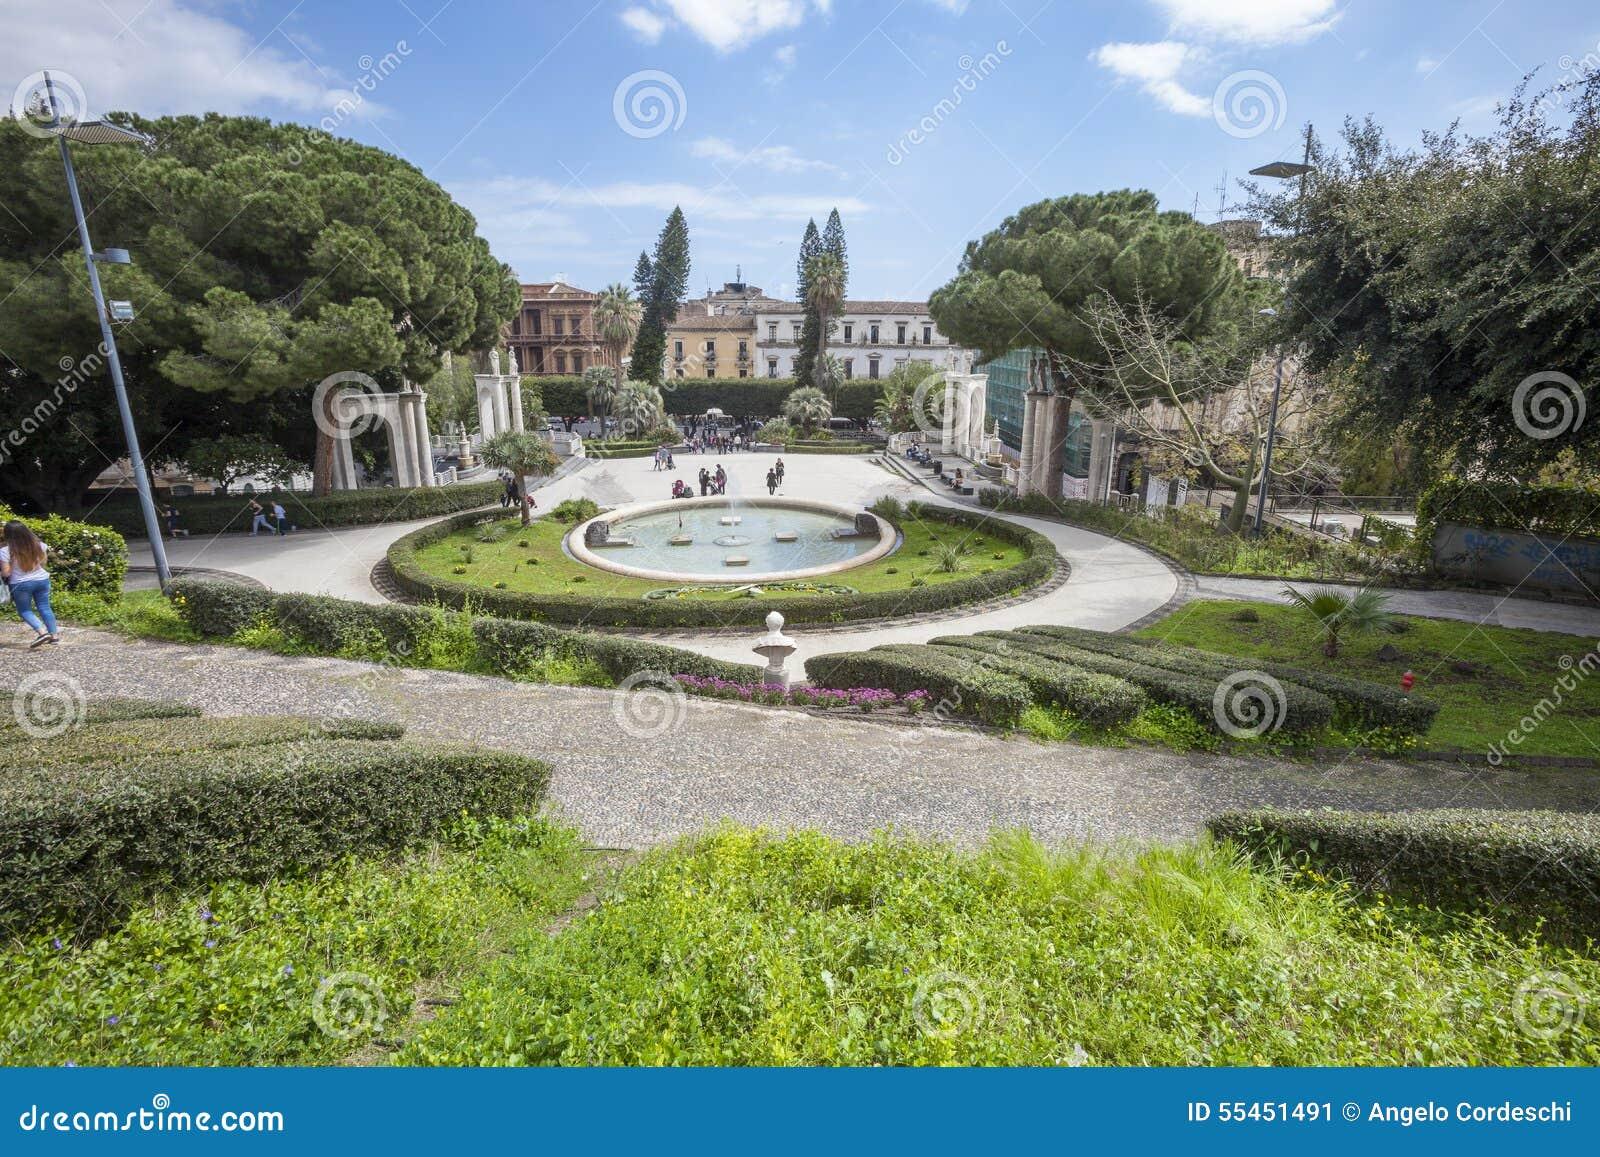 Bath swan fountain giardino bellini catania sicily for Torrisi arredi giardino catania